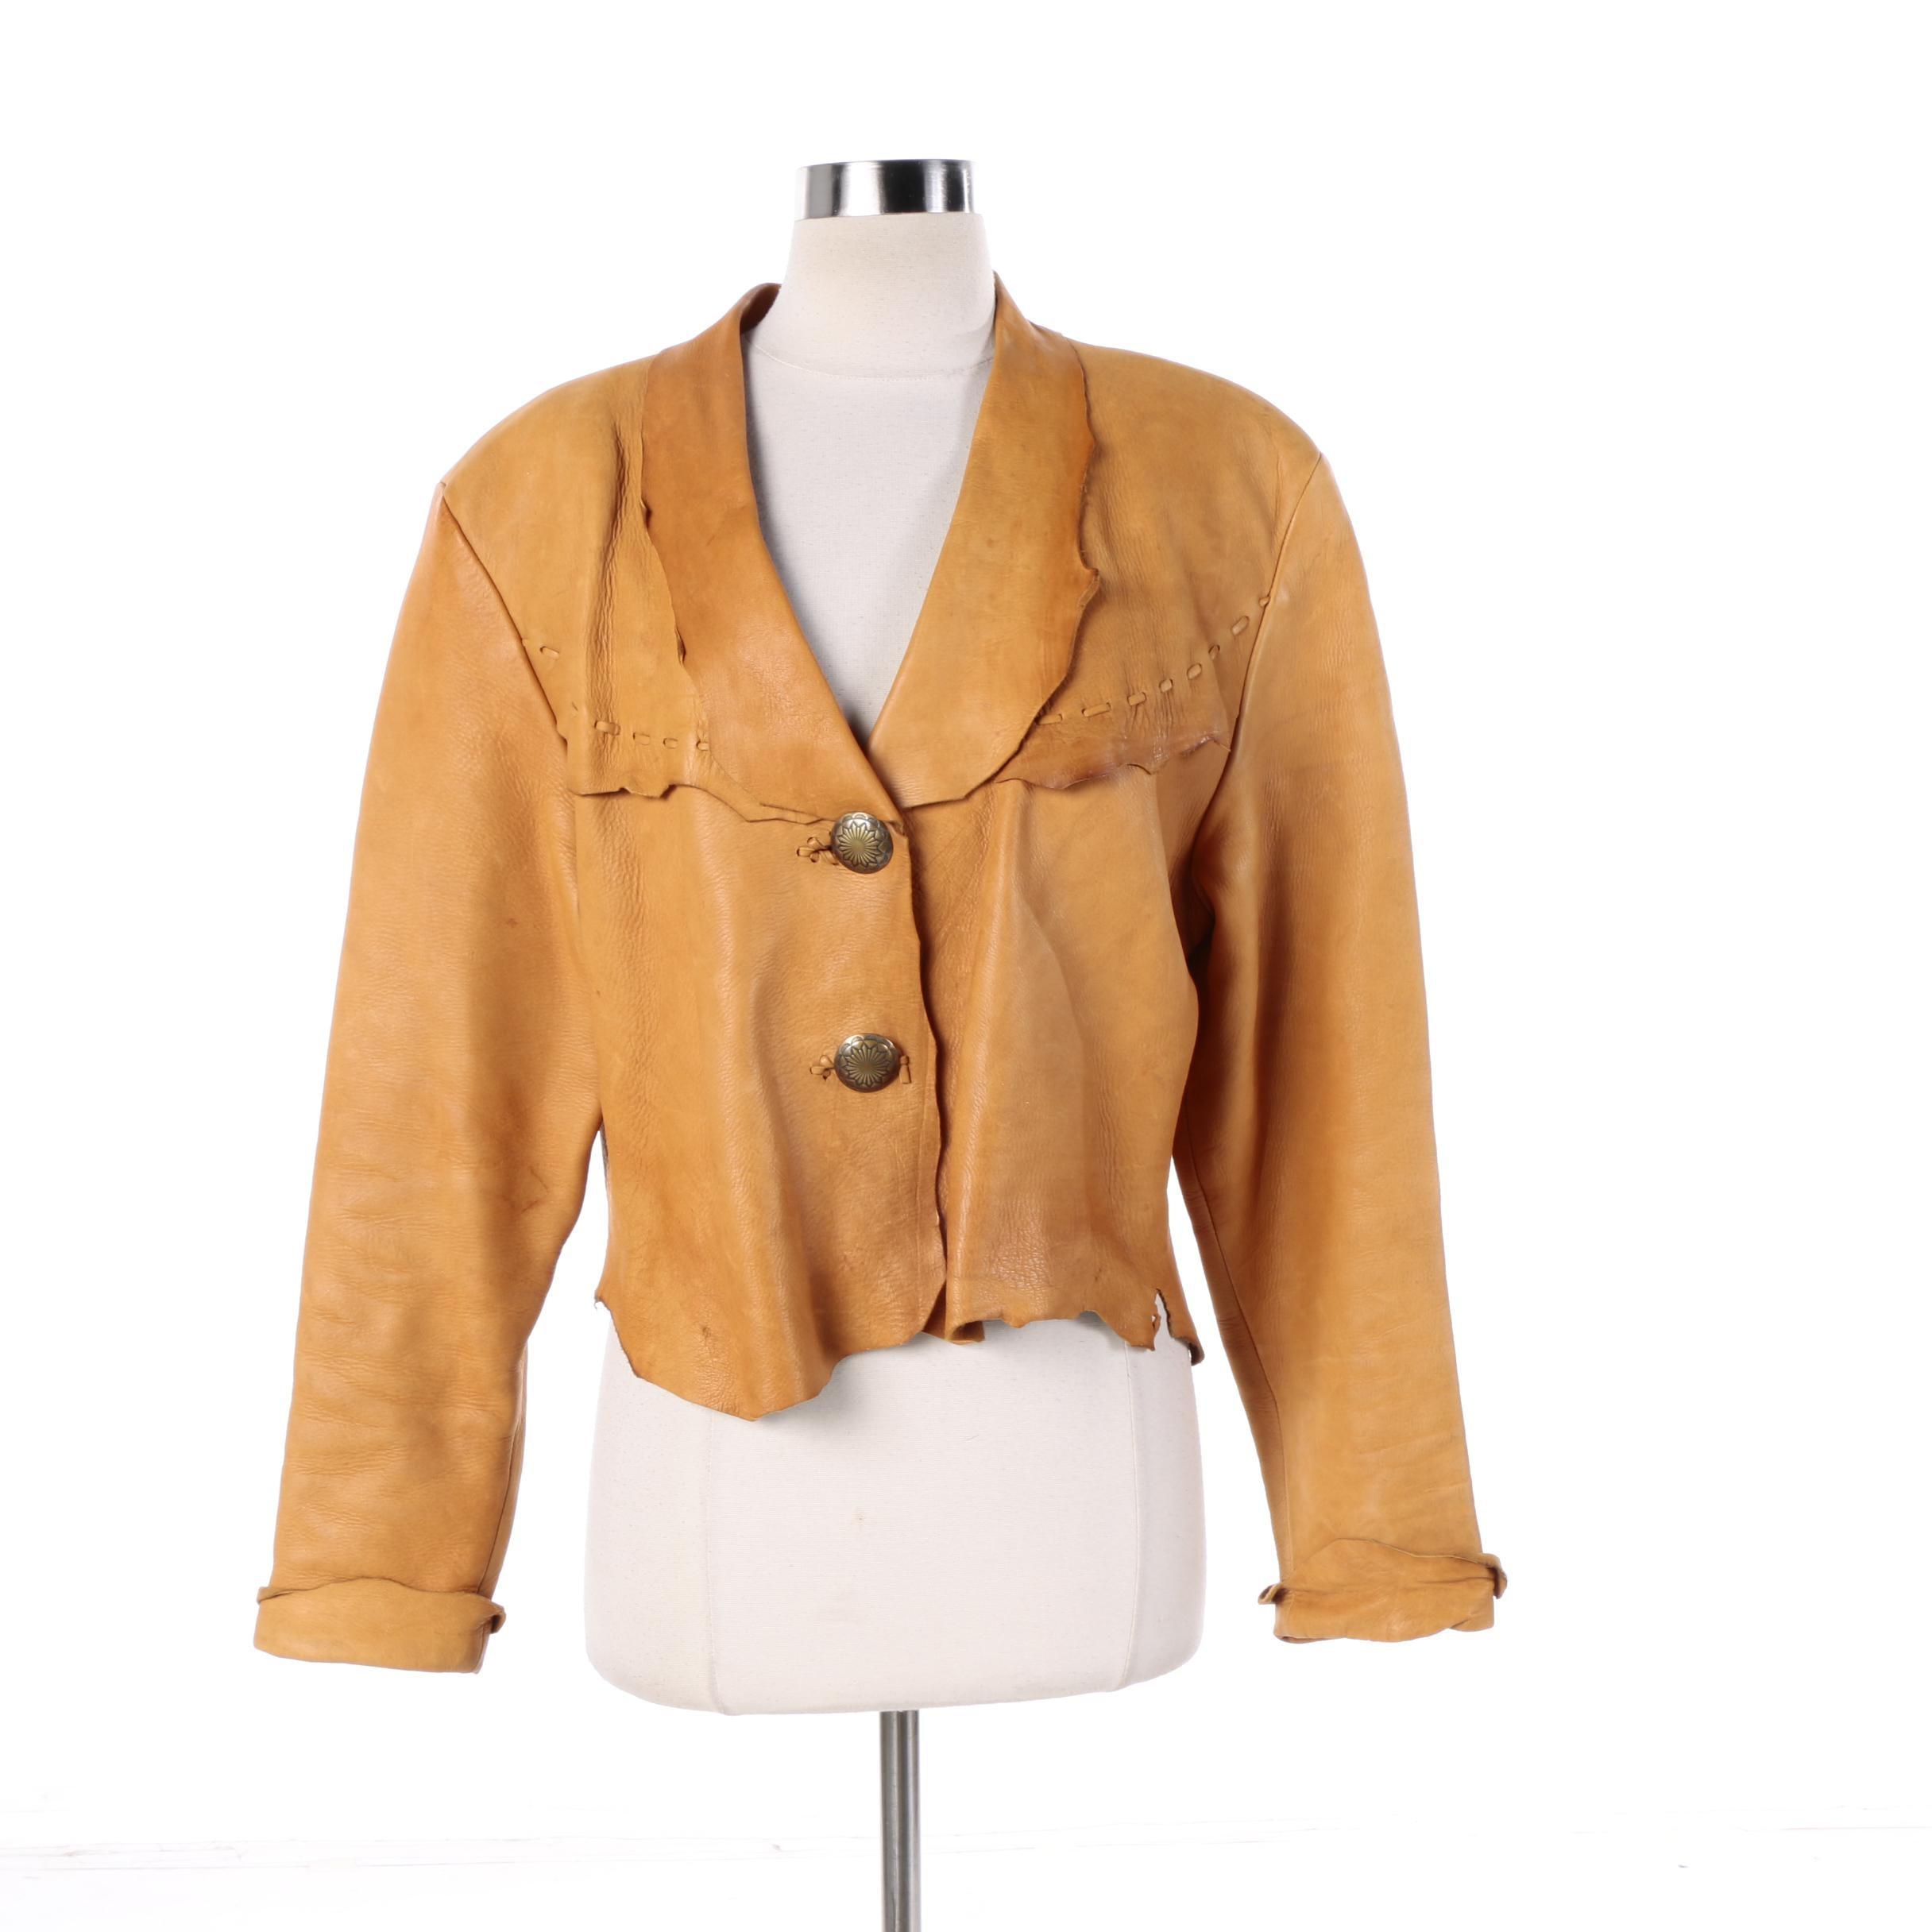 Women's Zephyr Unlimited Raw Edge Leather Jacket